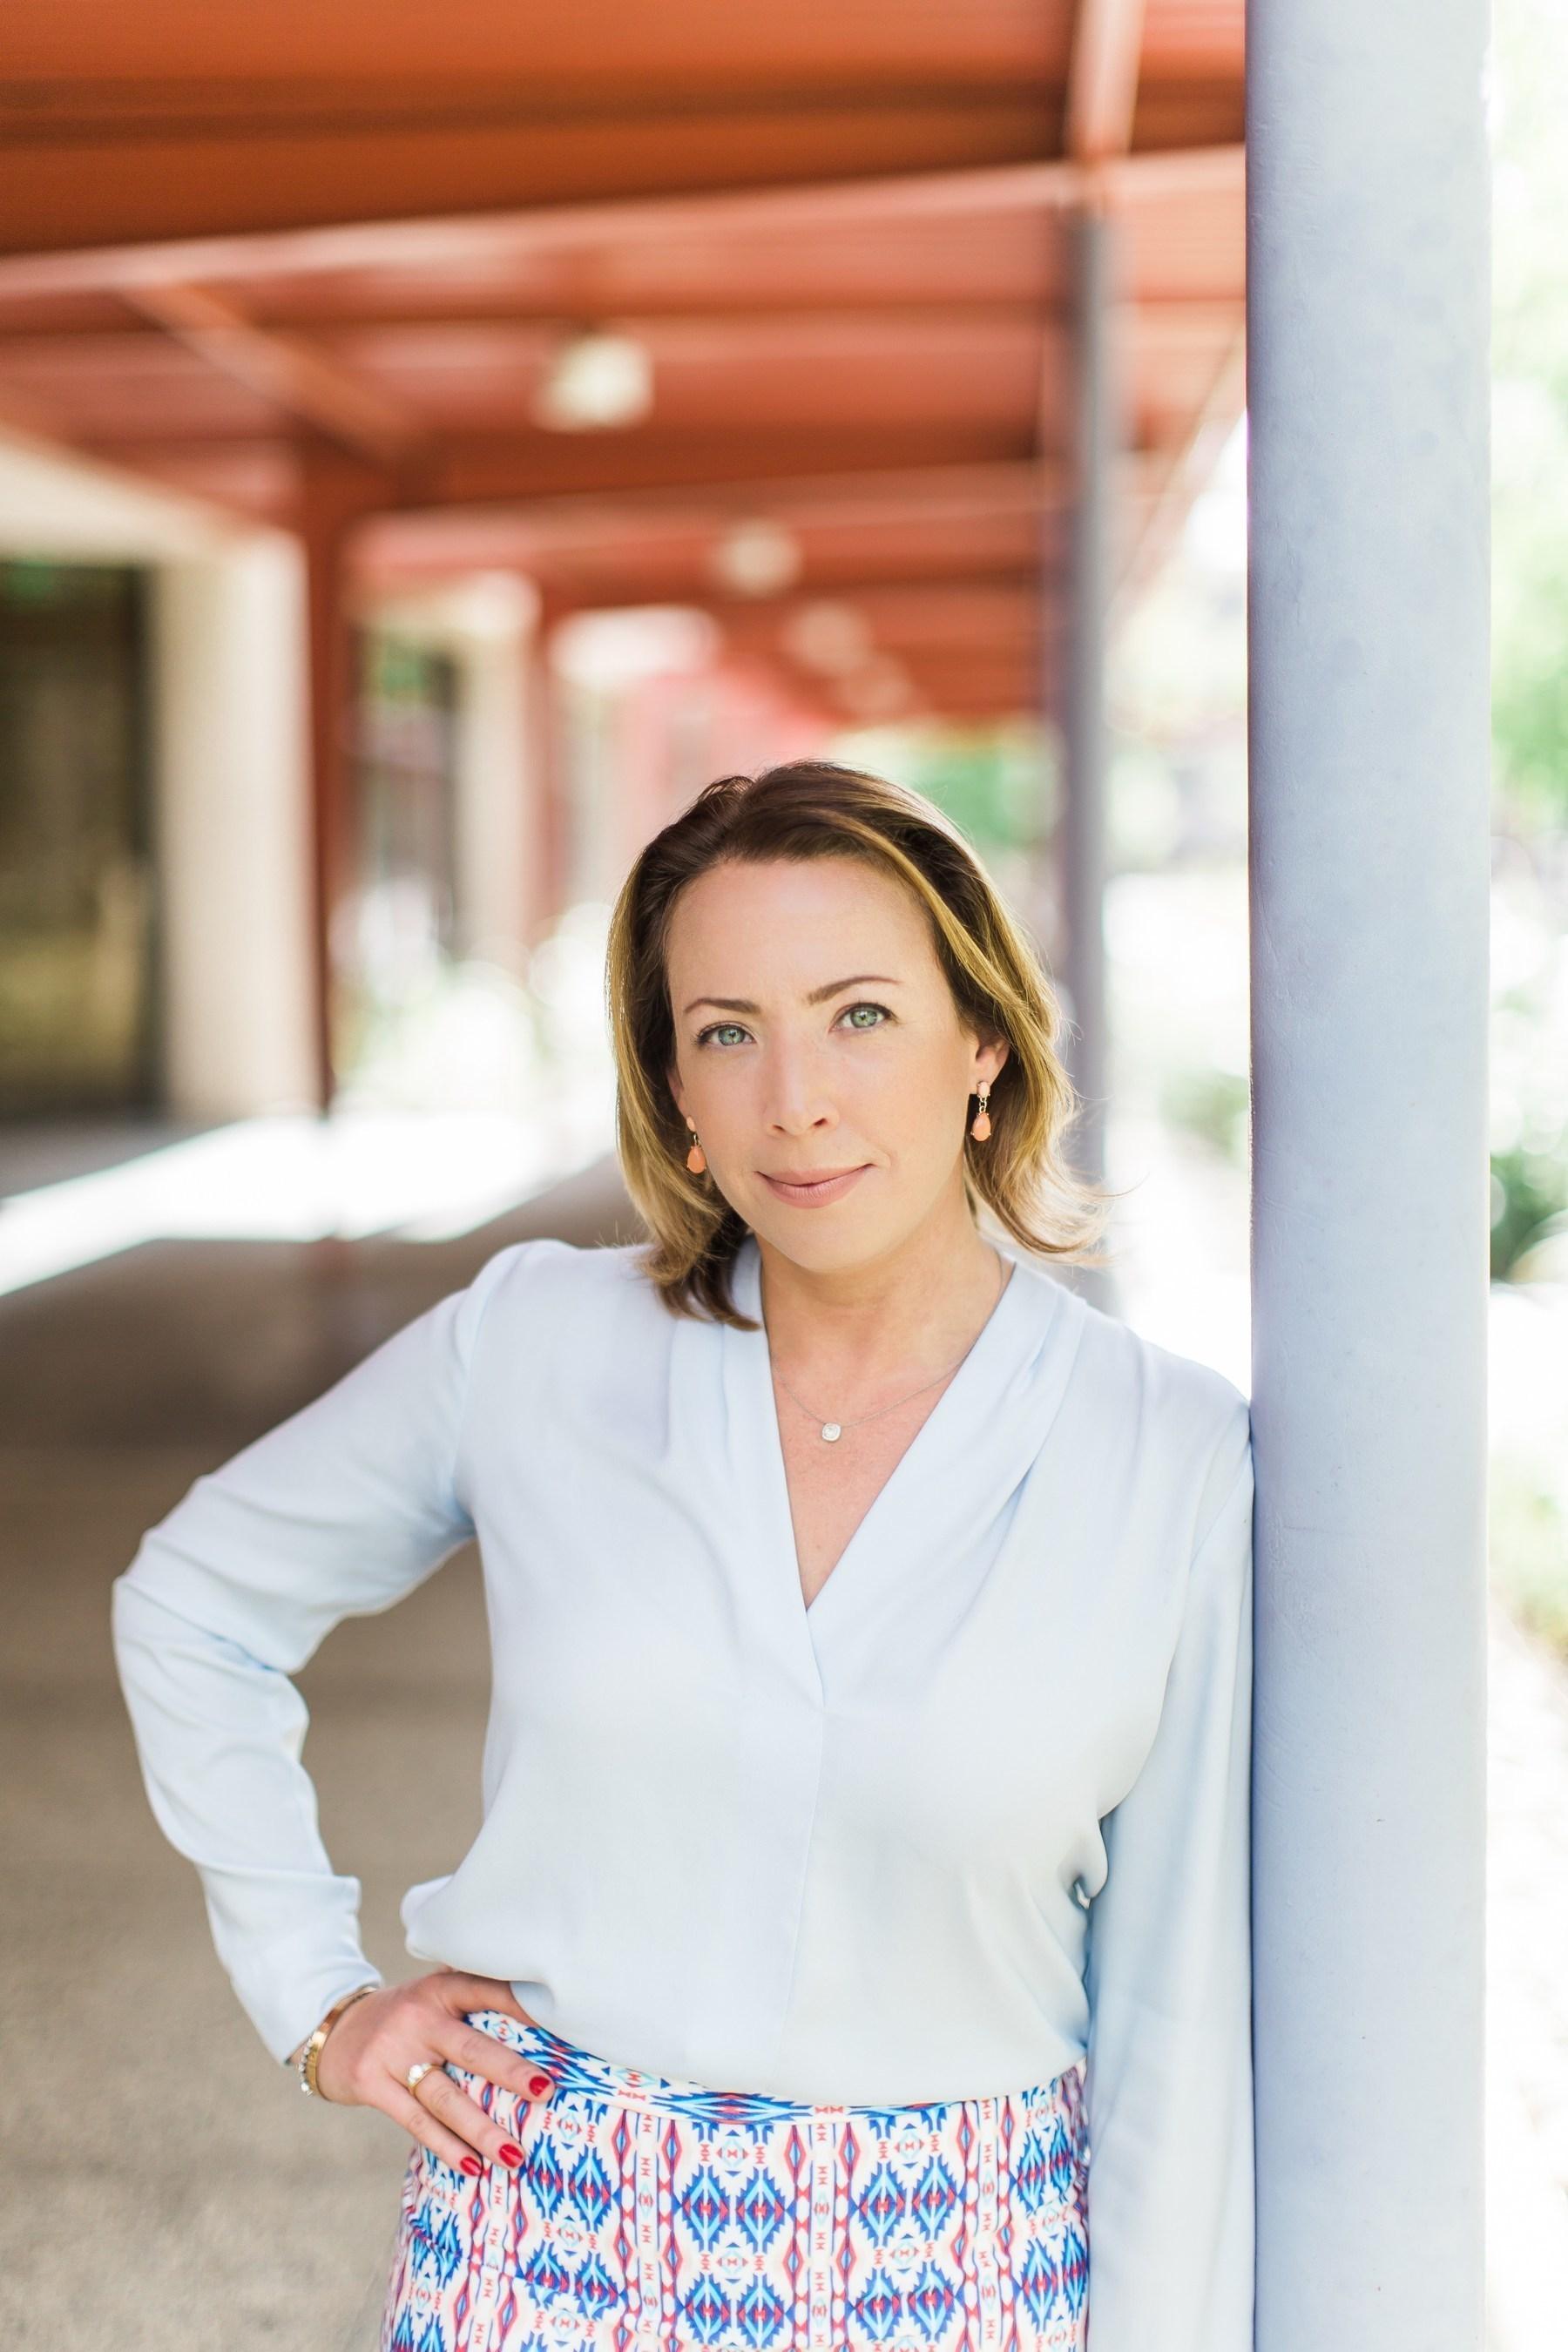 Suzie Elliott, Head of Human Resources for Farmers Insurance